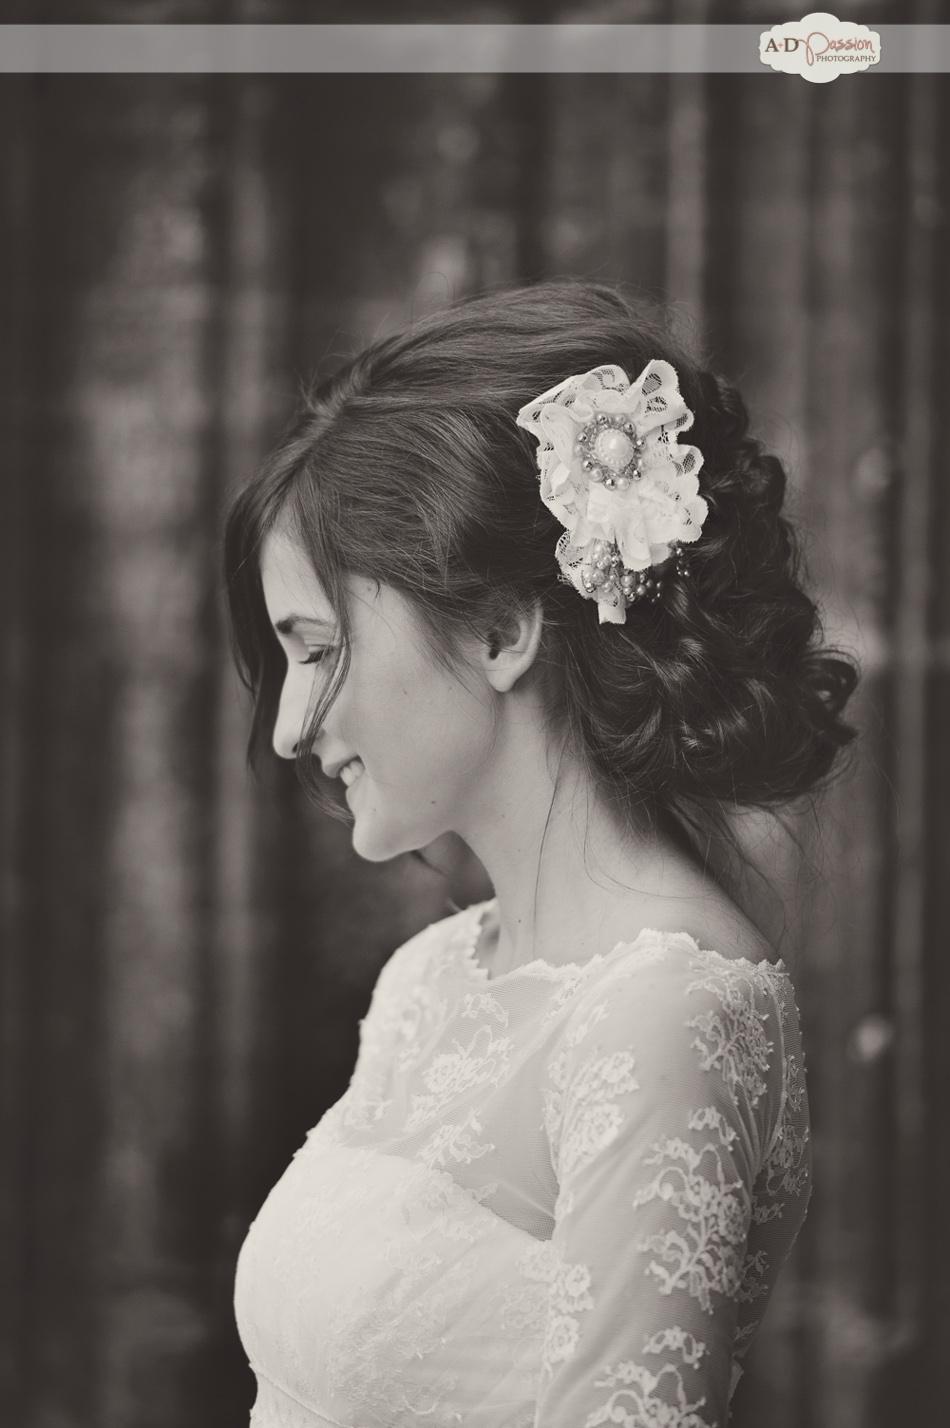 AD Passion Photography | 20130529_fotograf-nunta_elisa_si_marius_0079 | Adelin, Dida, fotograf profesionist, fotograf de nunta, fotografie de nunta, fotograf Timisoara, fotograf Craiova, fotograf Bucuresti, fotograf Arad, nunta Timisoara, nunta Arad, nunta Bucuresti, nunta Craiova